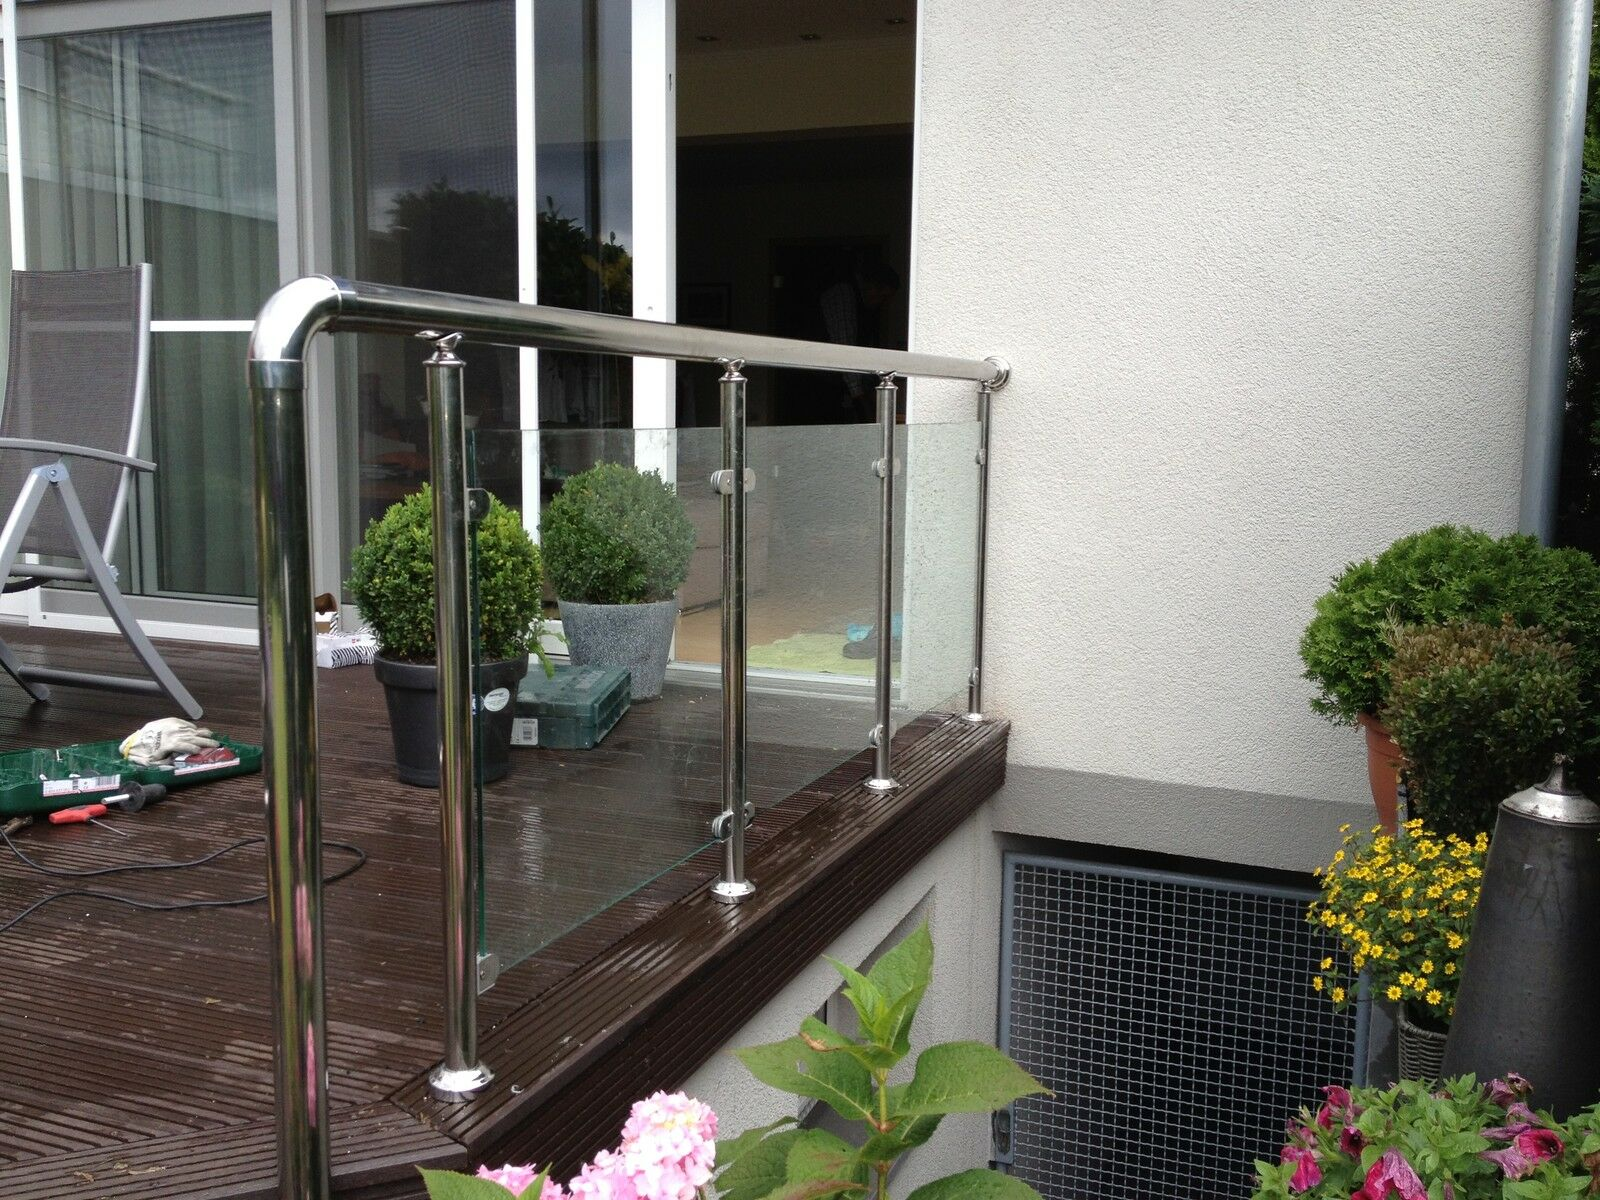 balkongel nder glas aluminium balkon gel nder vsg glas eur 89 91 picclick de. Black Bedroom Furniture Sets. Home Design Ideas